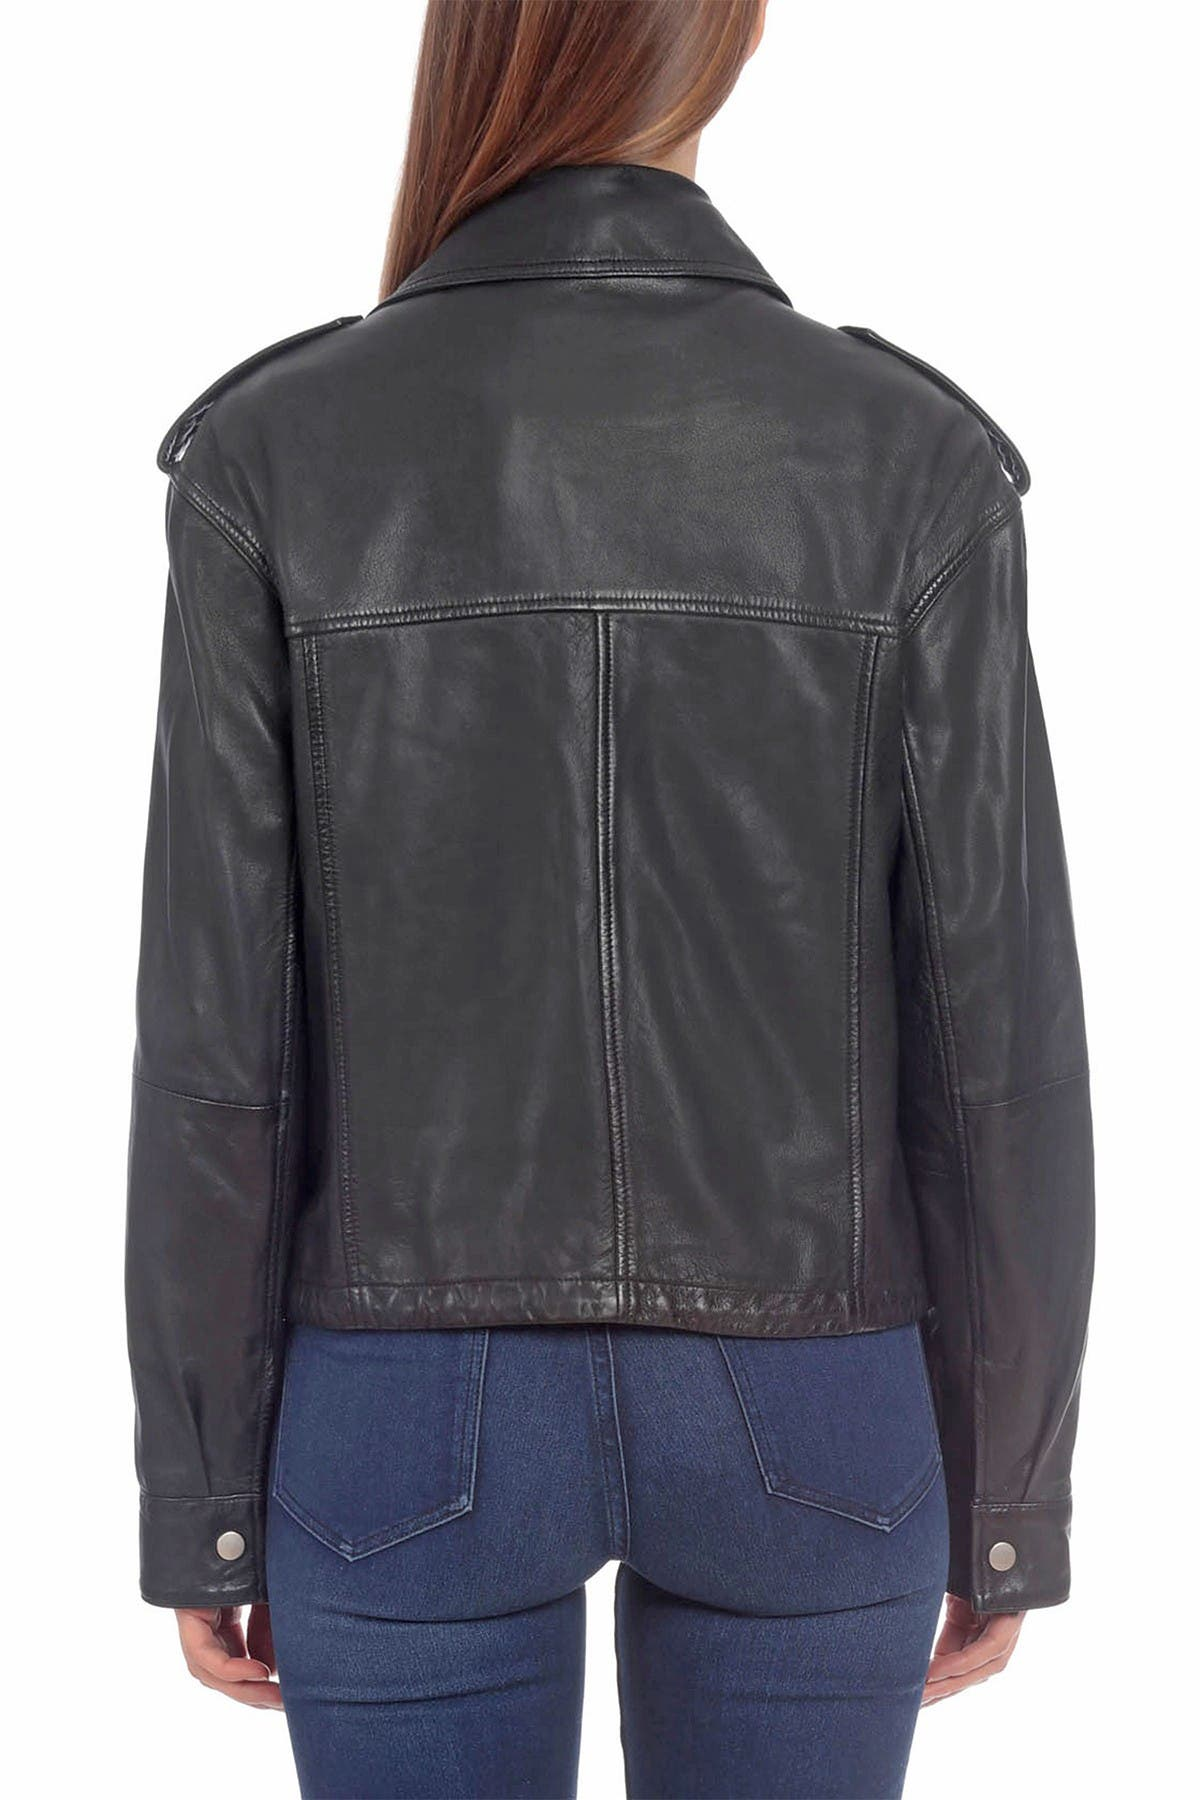 Image of Bagatelle Leather Army Jacket